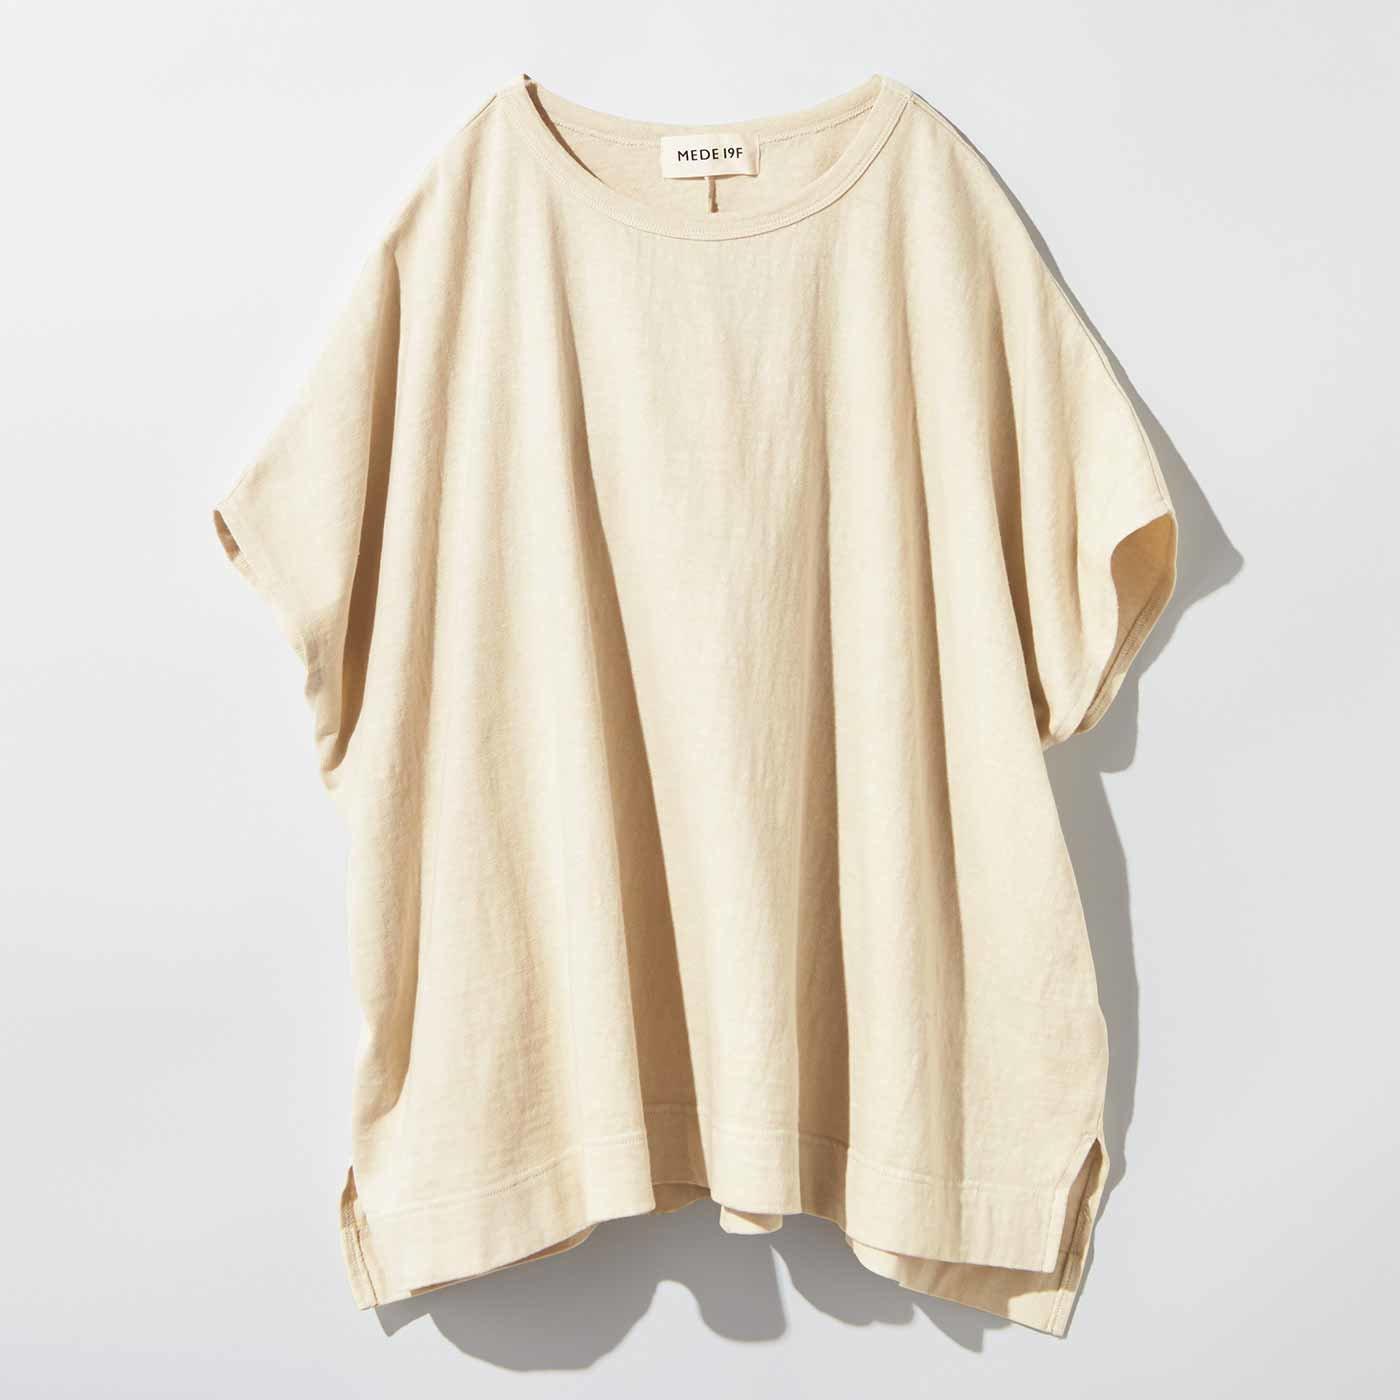 MEDE19F 製品染めポンチョTシャツ〈ライトベージュ〉